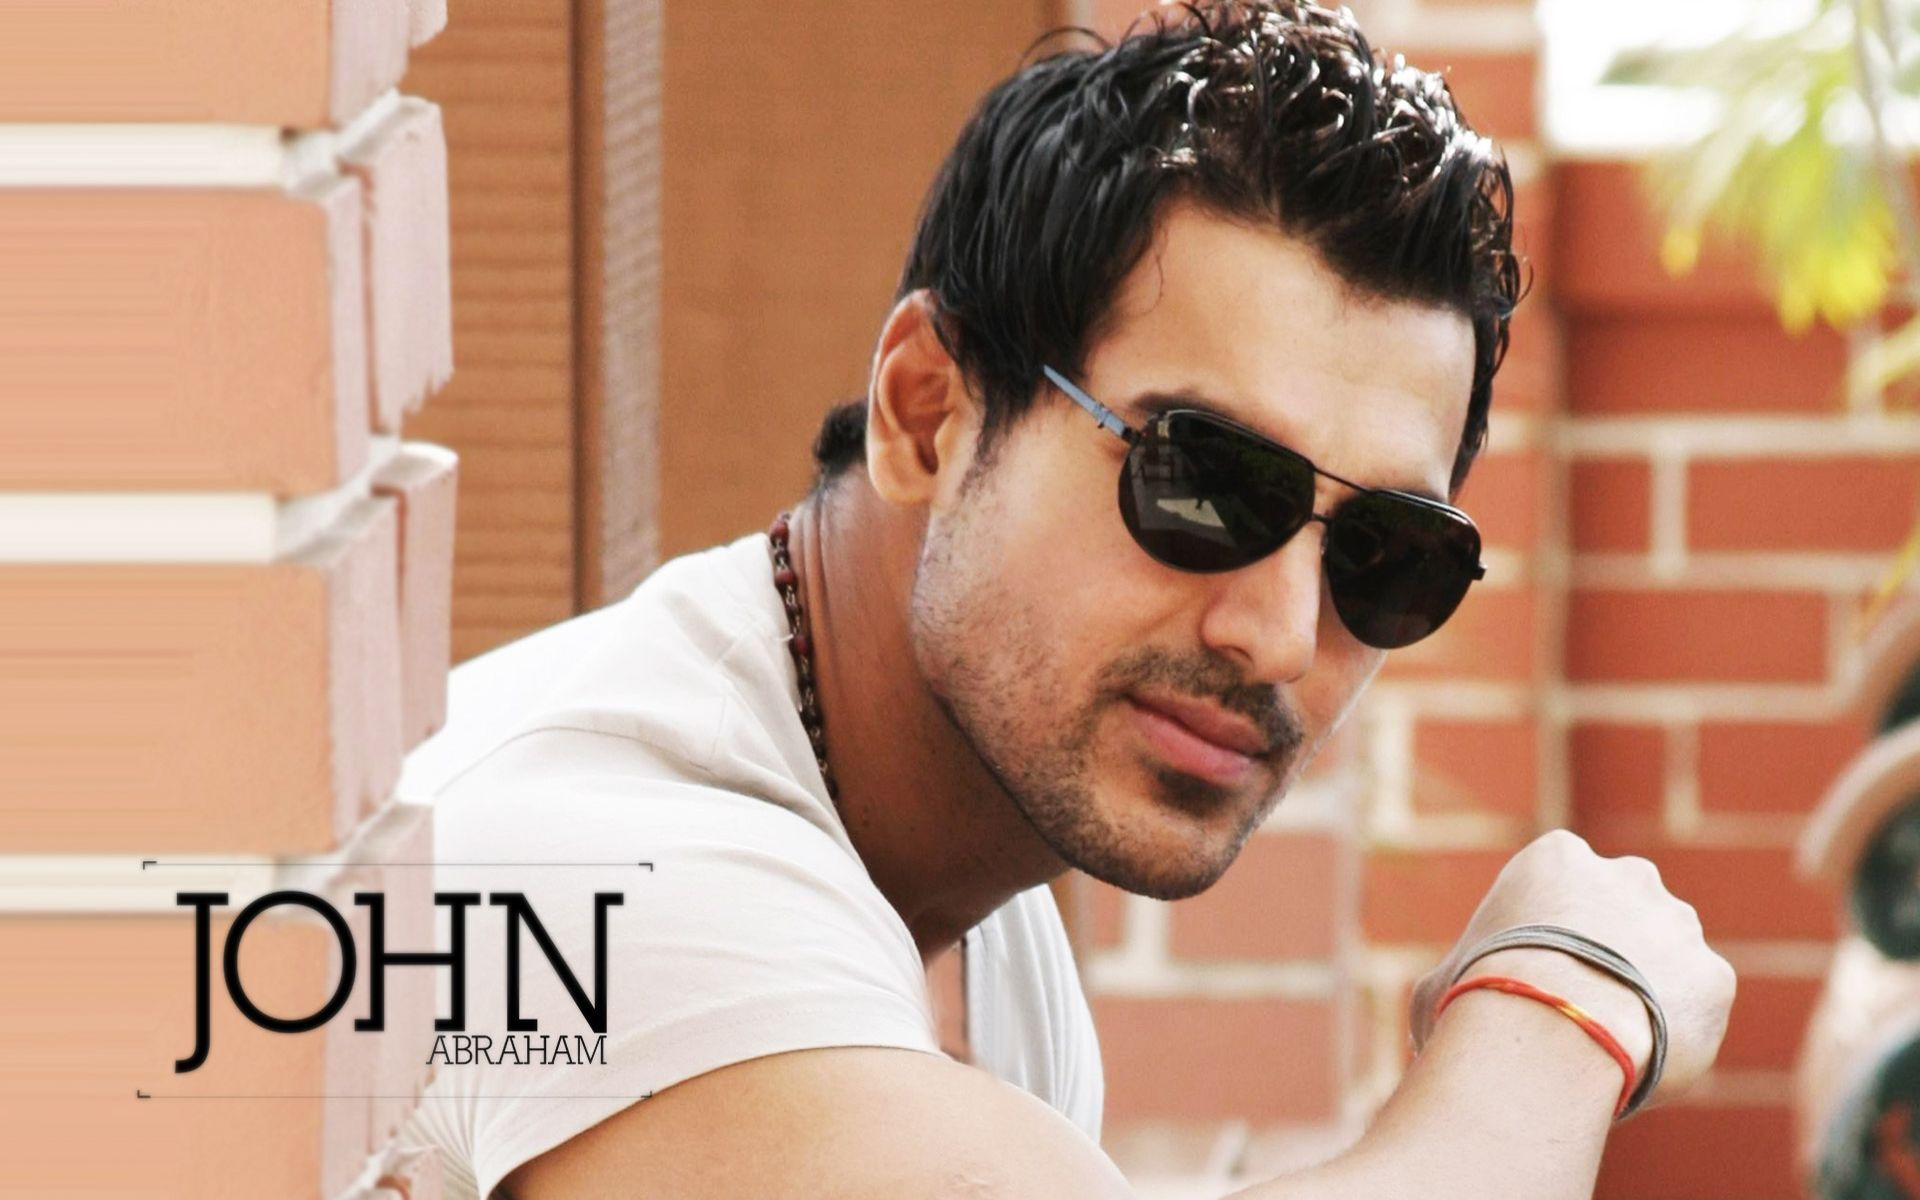 Wallpaper download bollywood actors - Sexy John Abraham Hdwallpaper John Abraham Bollywood Actor Hd Wallpapers 1080p John